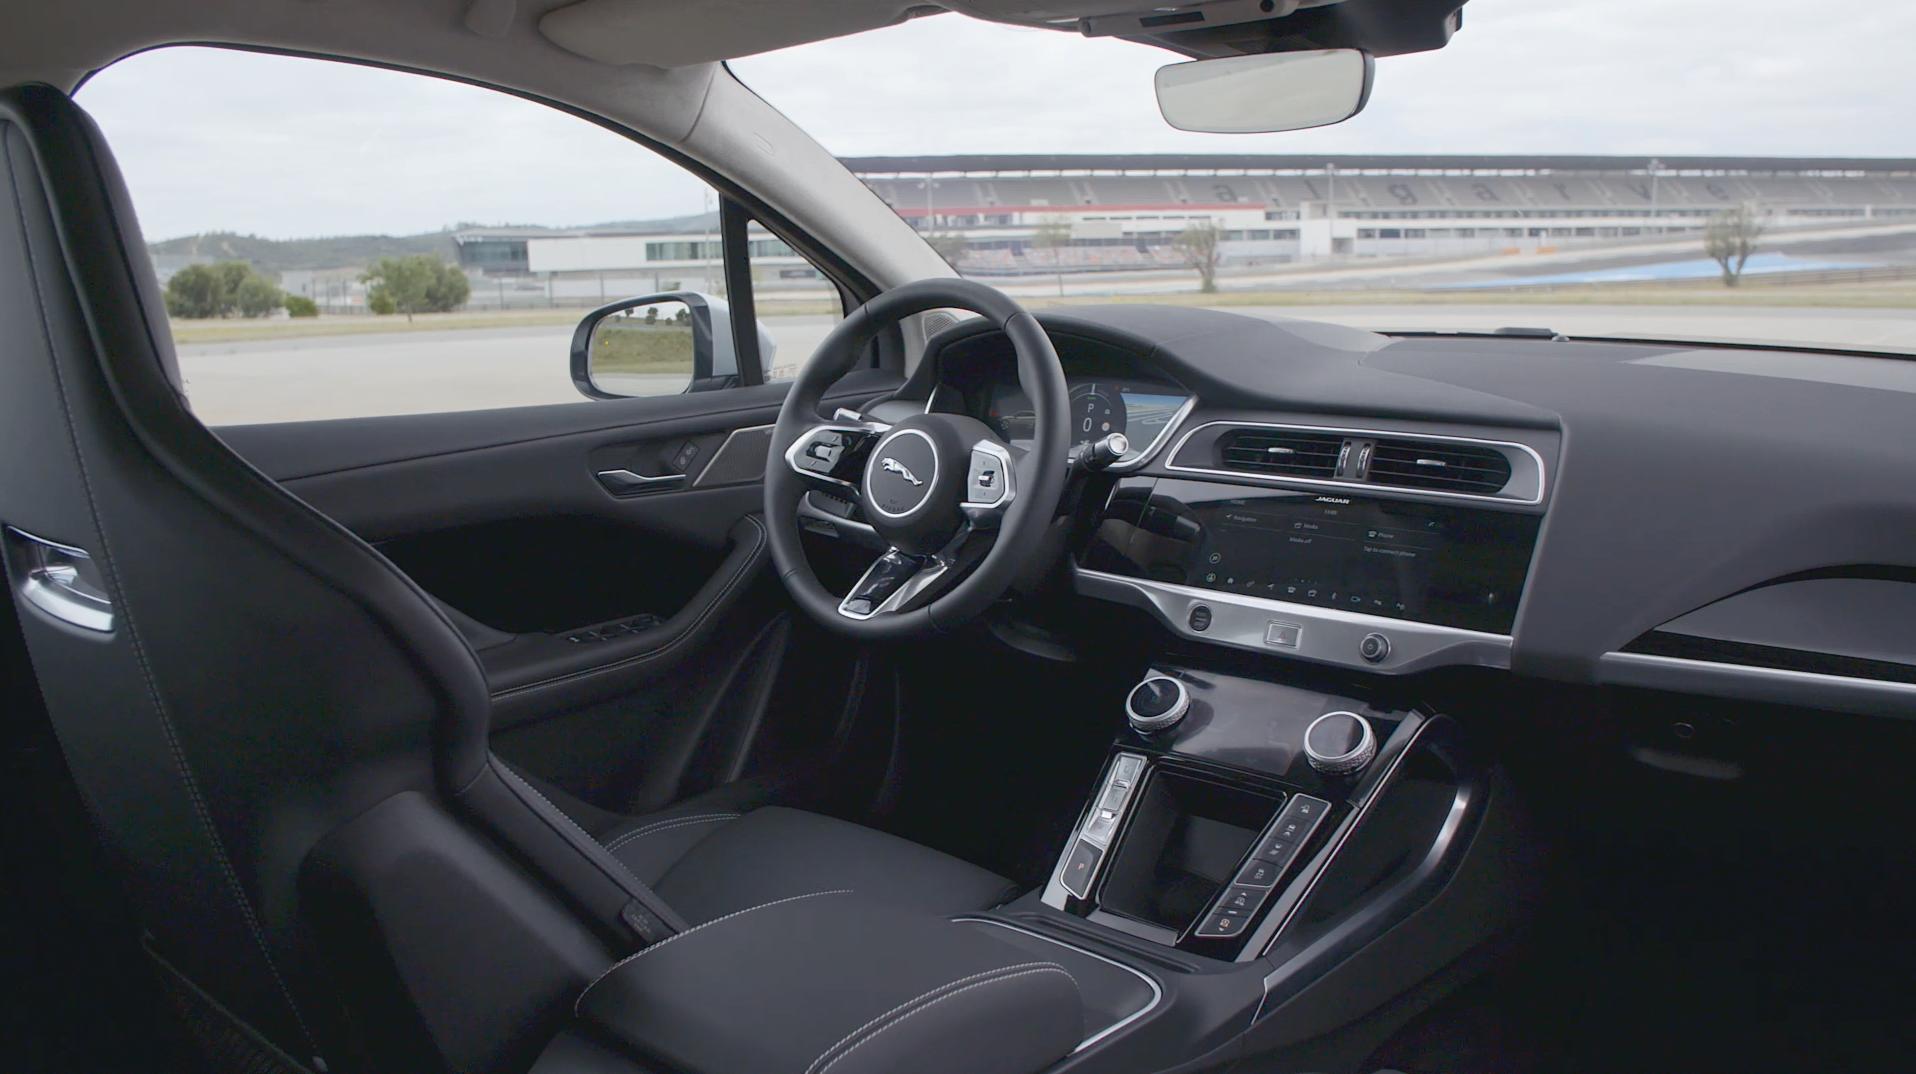 2019 Jaguar I-PACE B-Roll Silver Interiors.